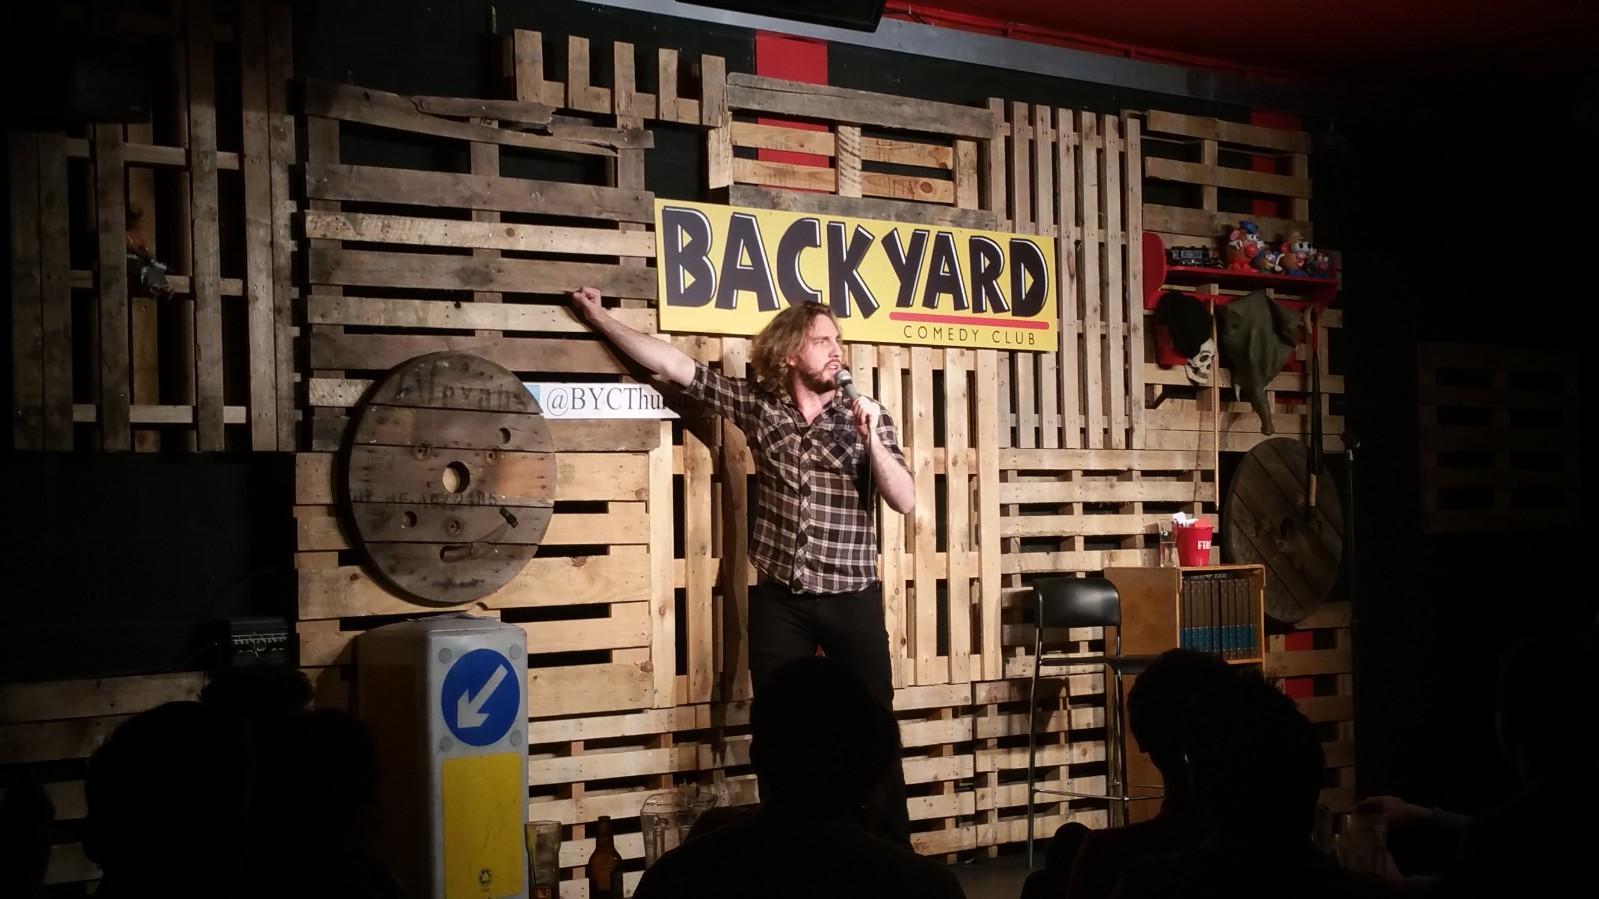 Backyard Comedy Club